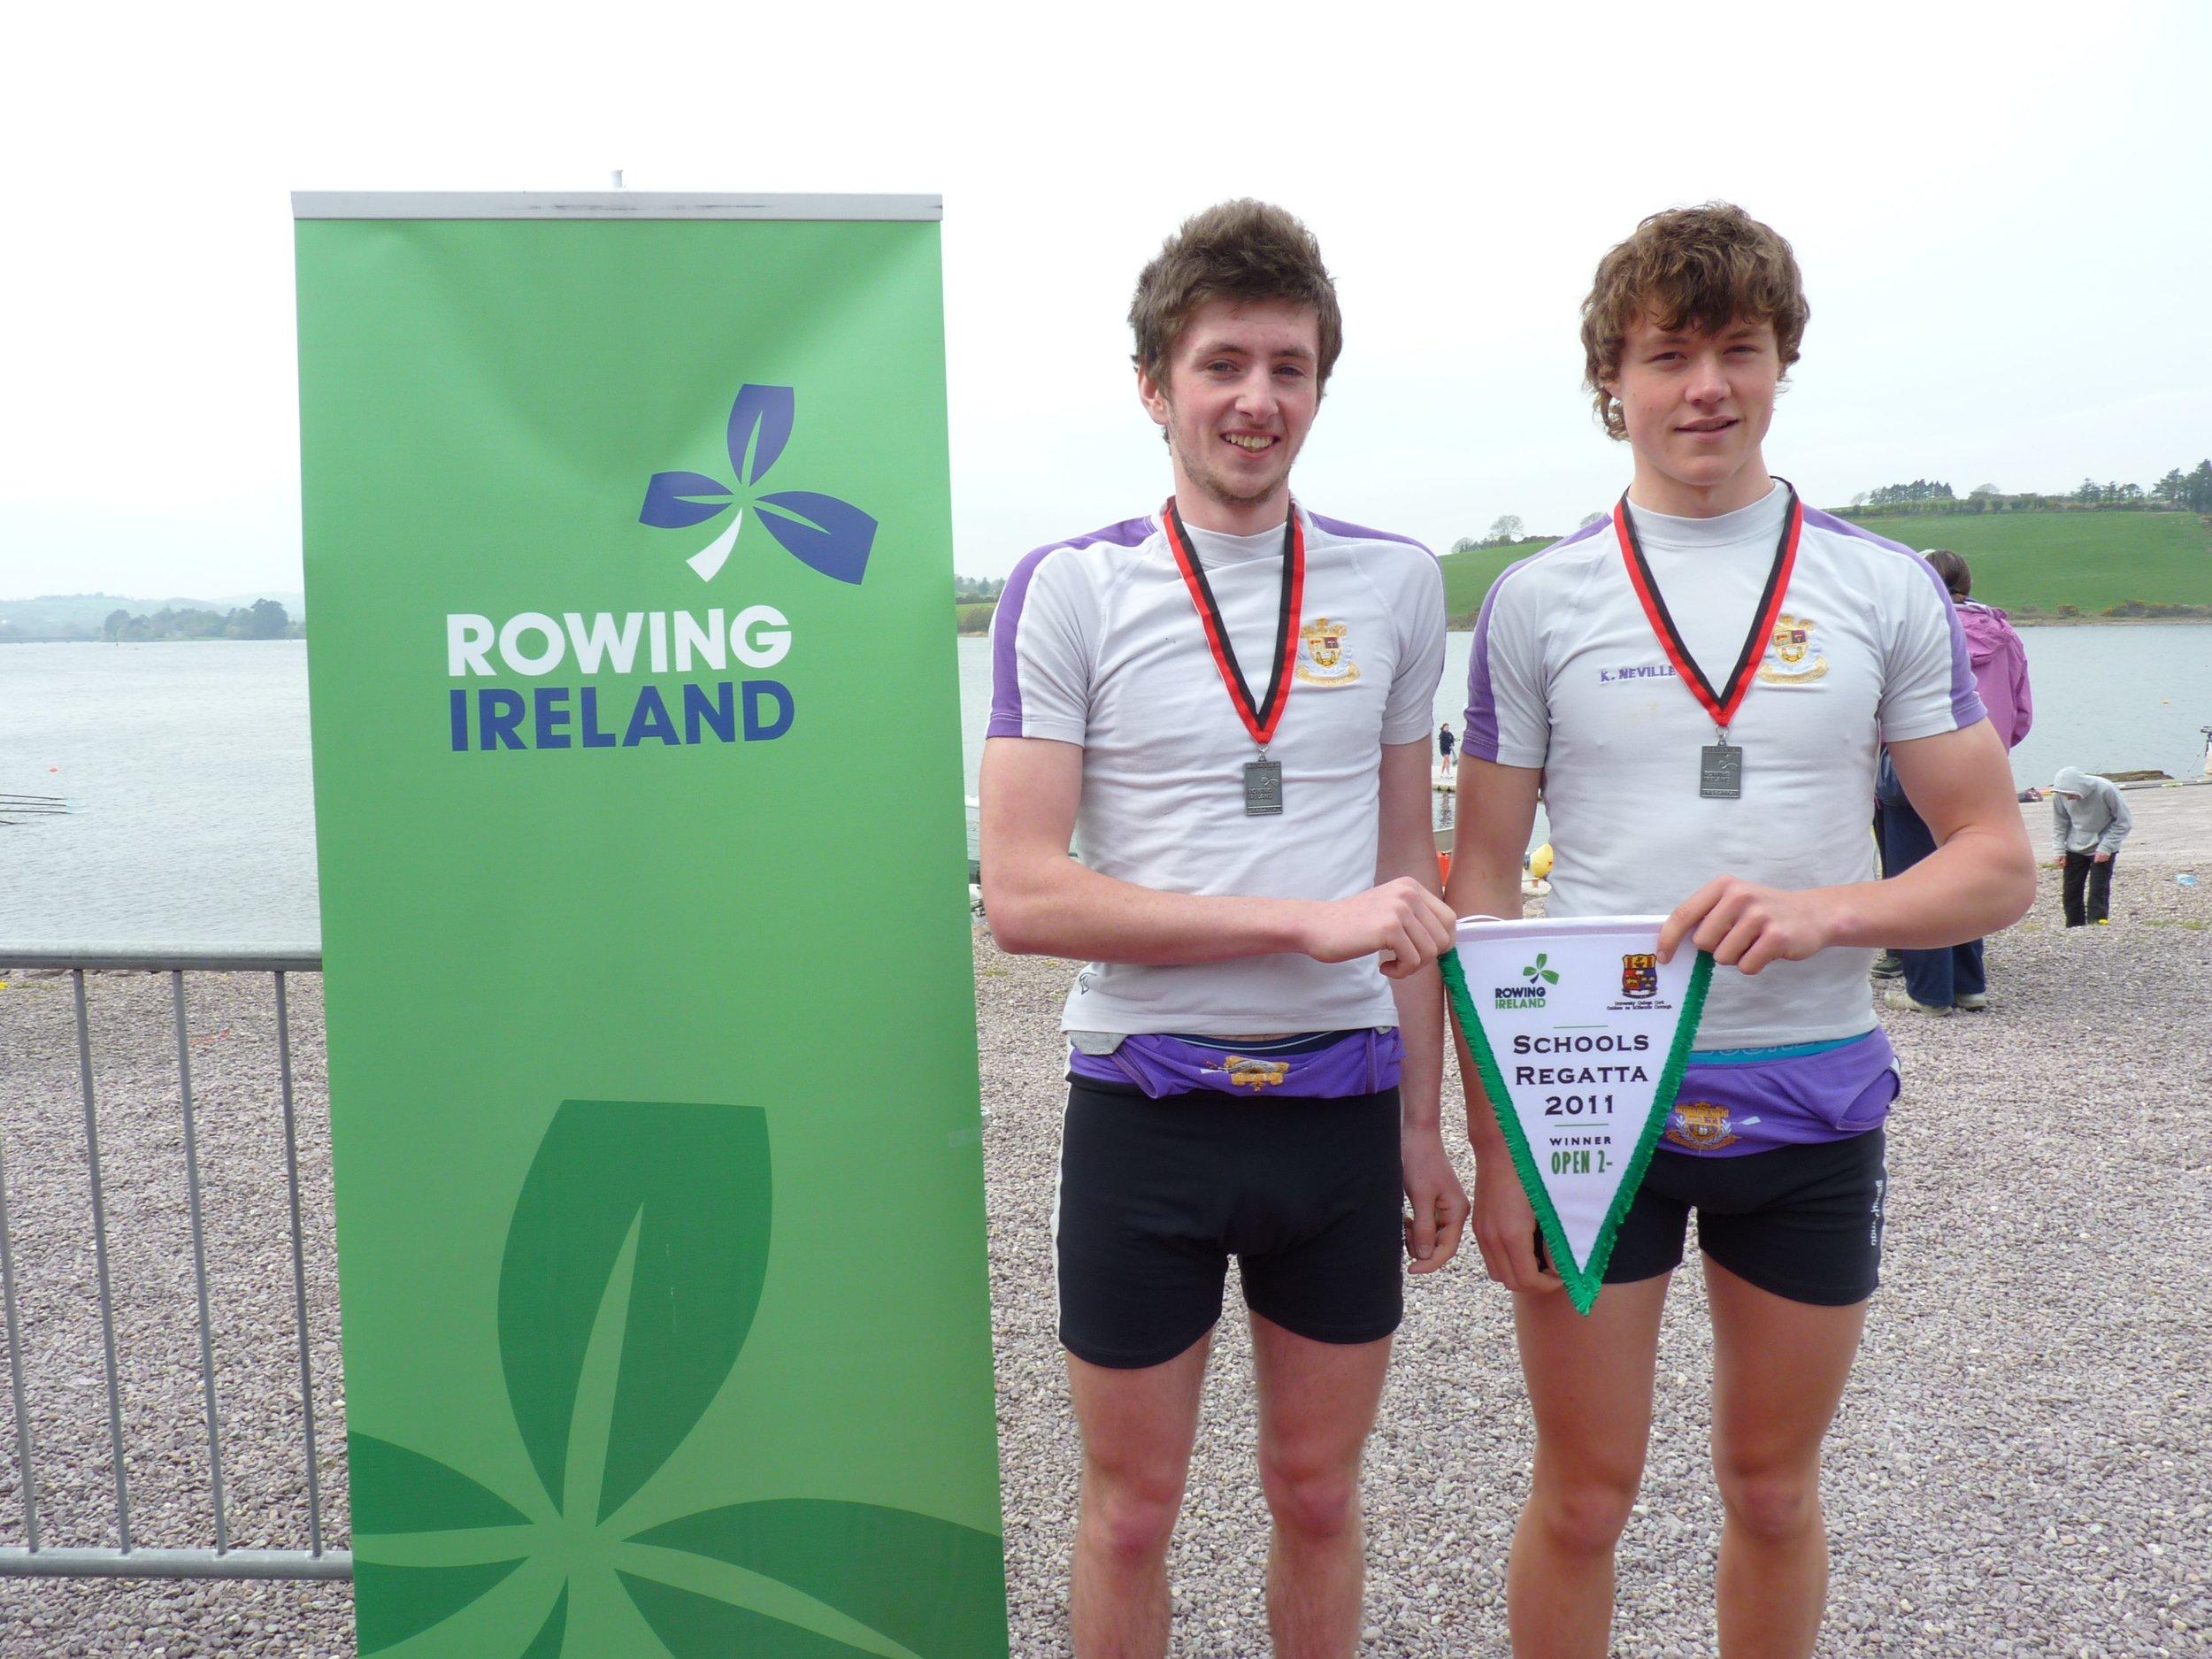 Senior Pairs - Schools Champions of Ireland 2011